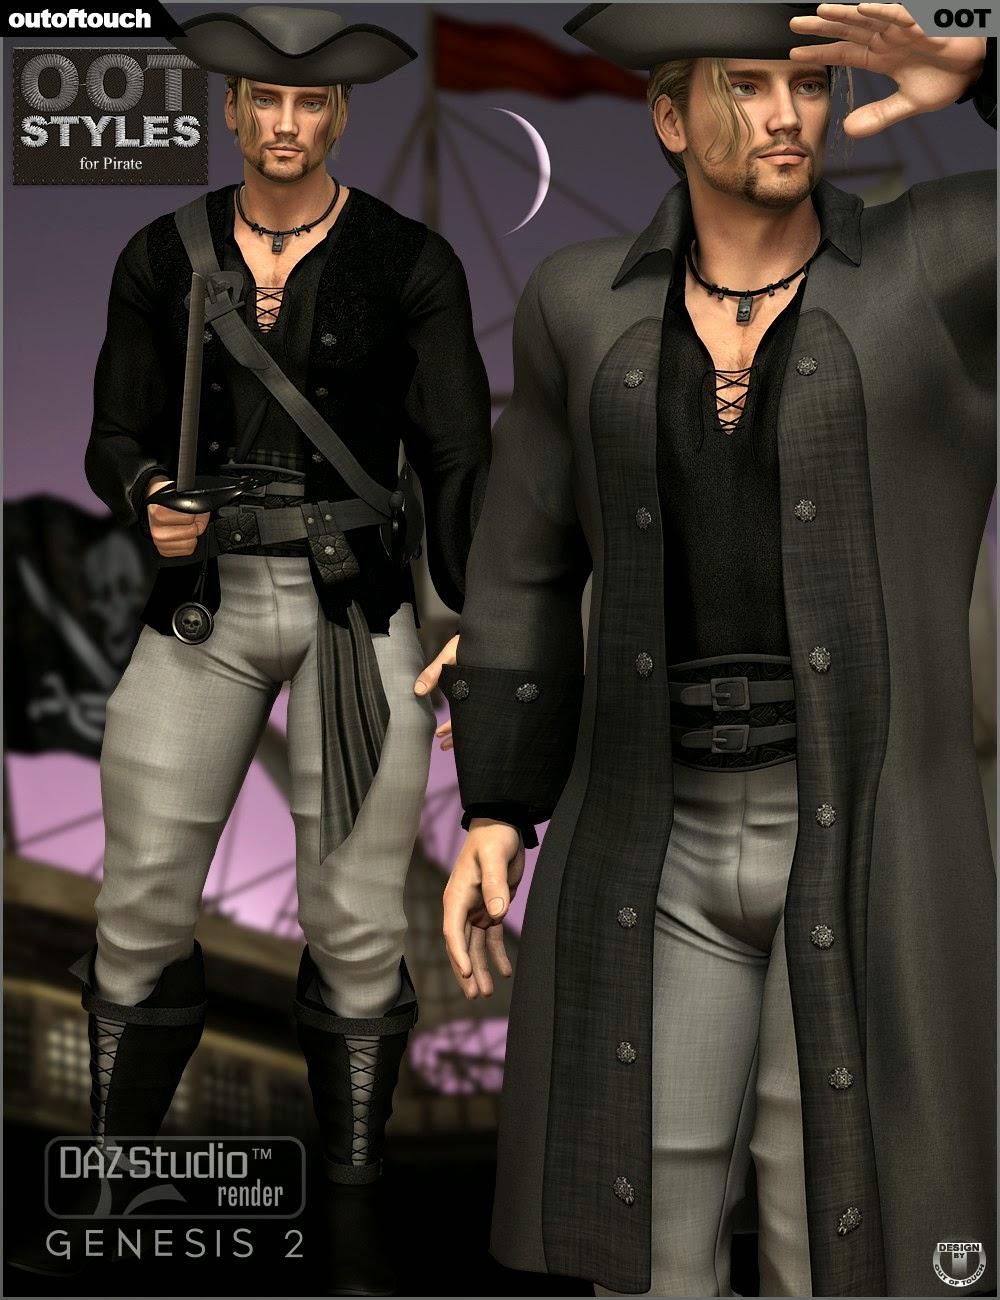 Styles OOT pour Pirate pour Genesis et Genesis 2 Homme